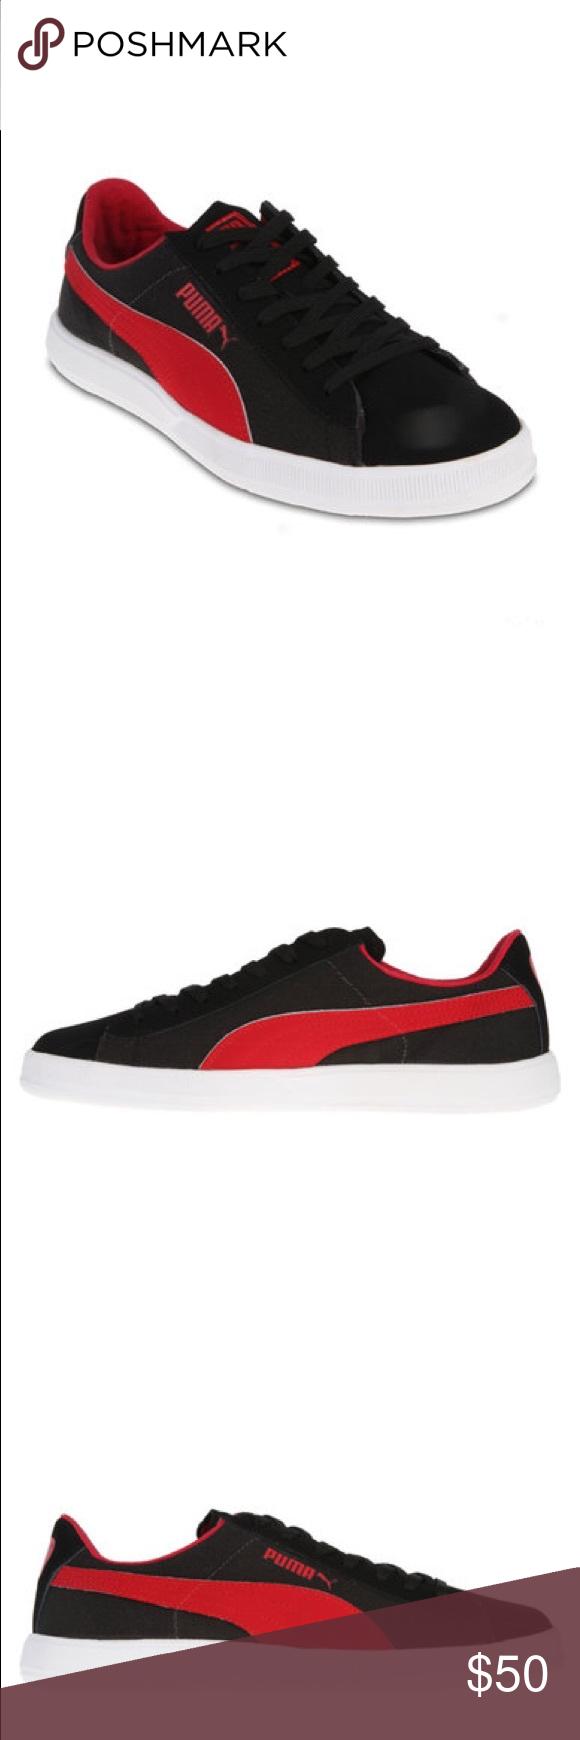 167c5375252 Puma Archive Lite Low Mix Red Black Sneakers NIB! Puma Archive Lite Low